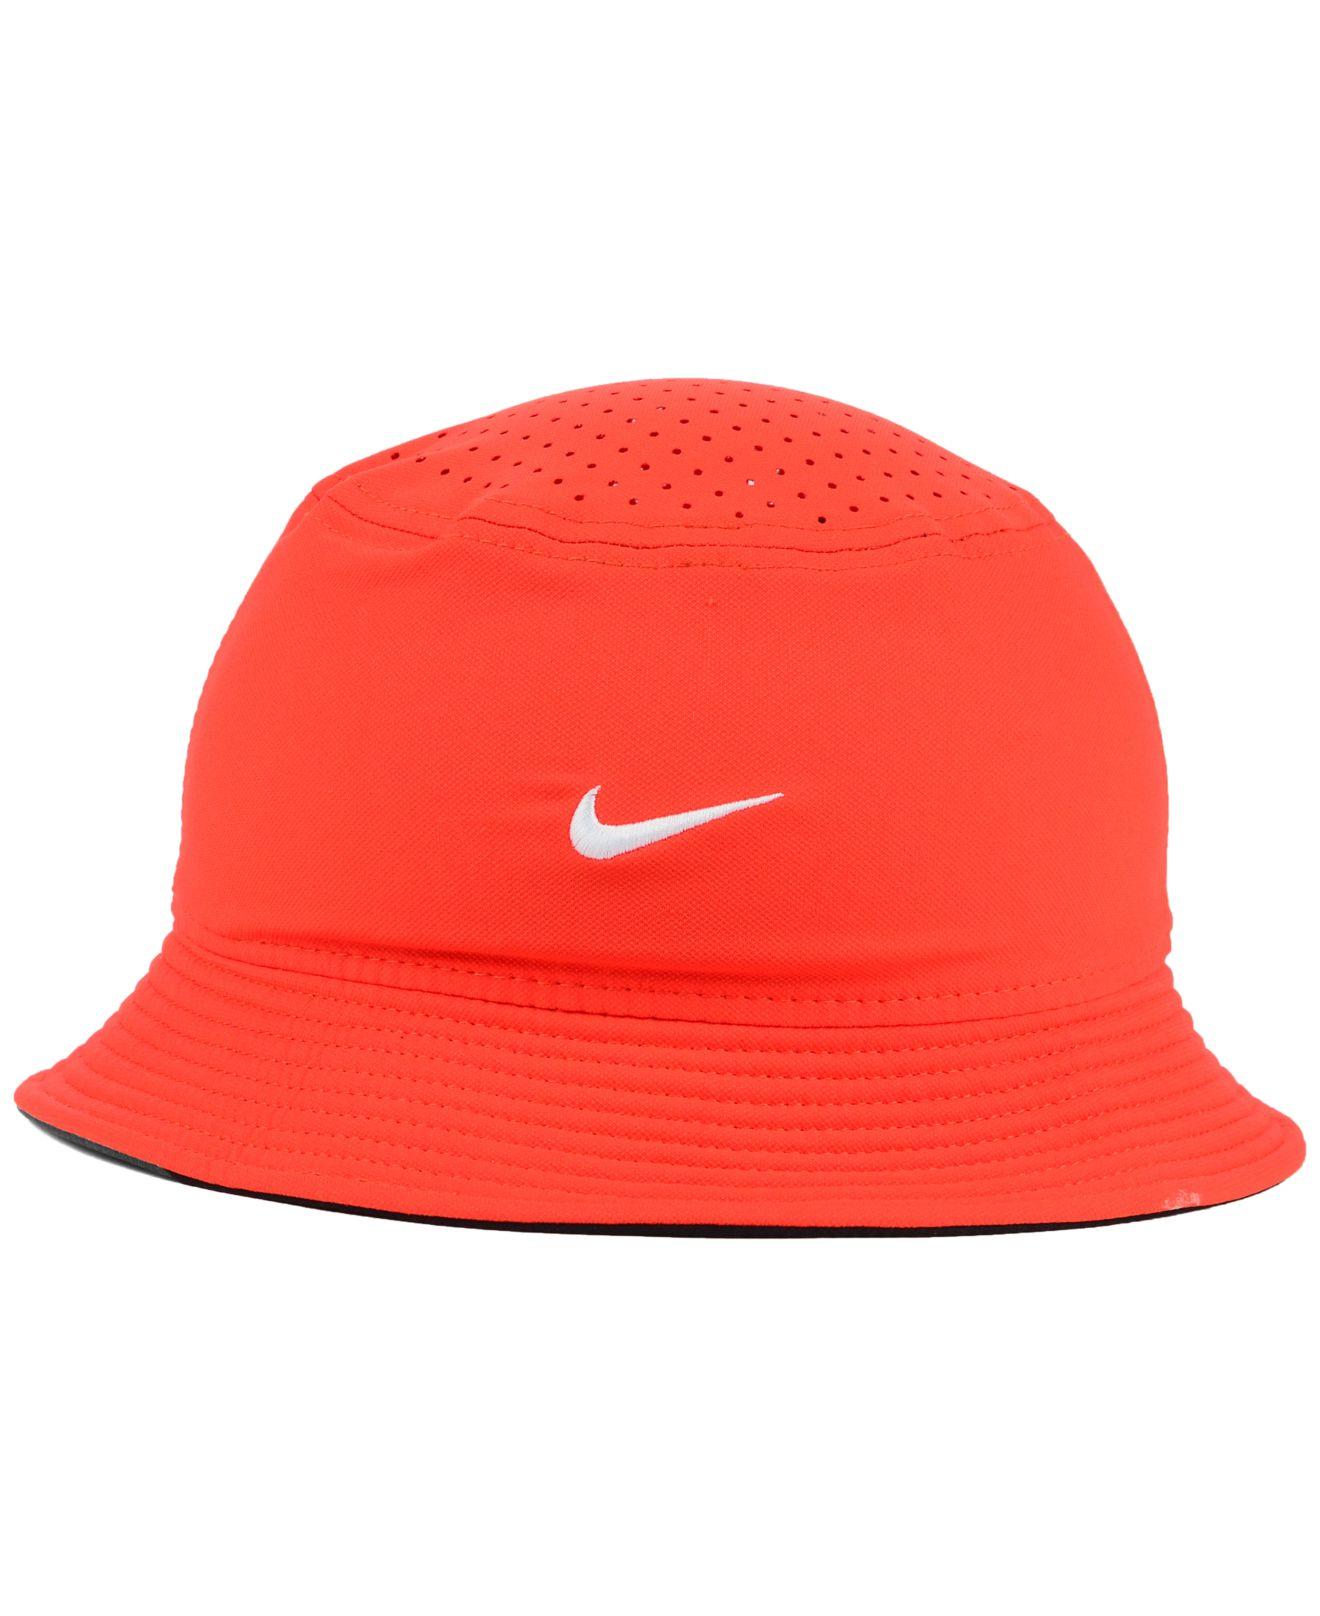 c78486c2d4f ... hot lyst nike clemson tigers vapor bucket hat in orange for men 79f98  9786a